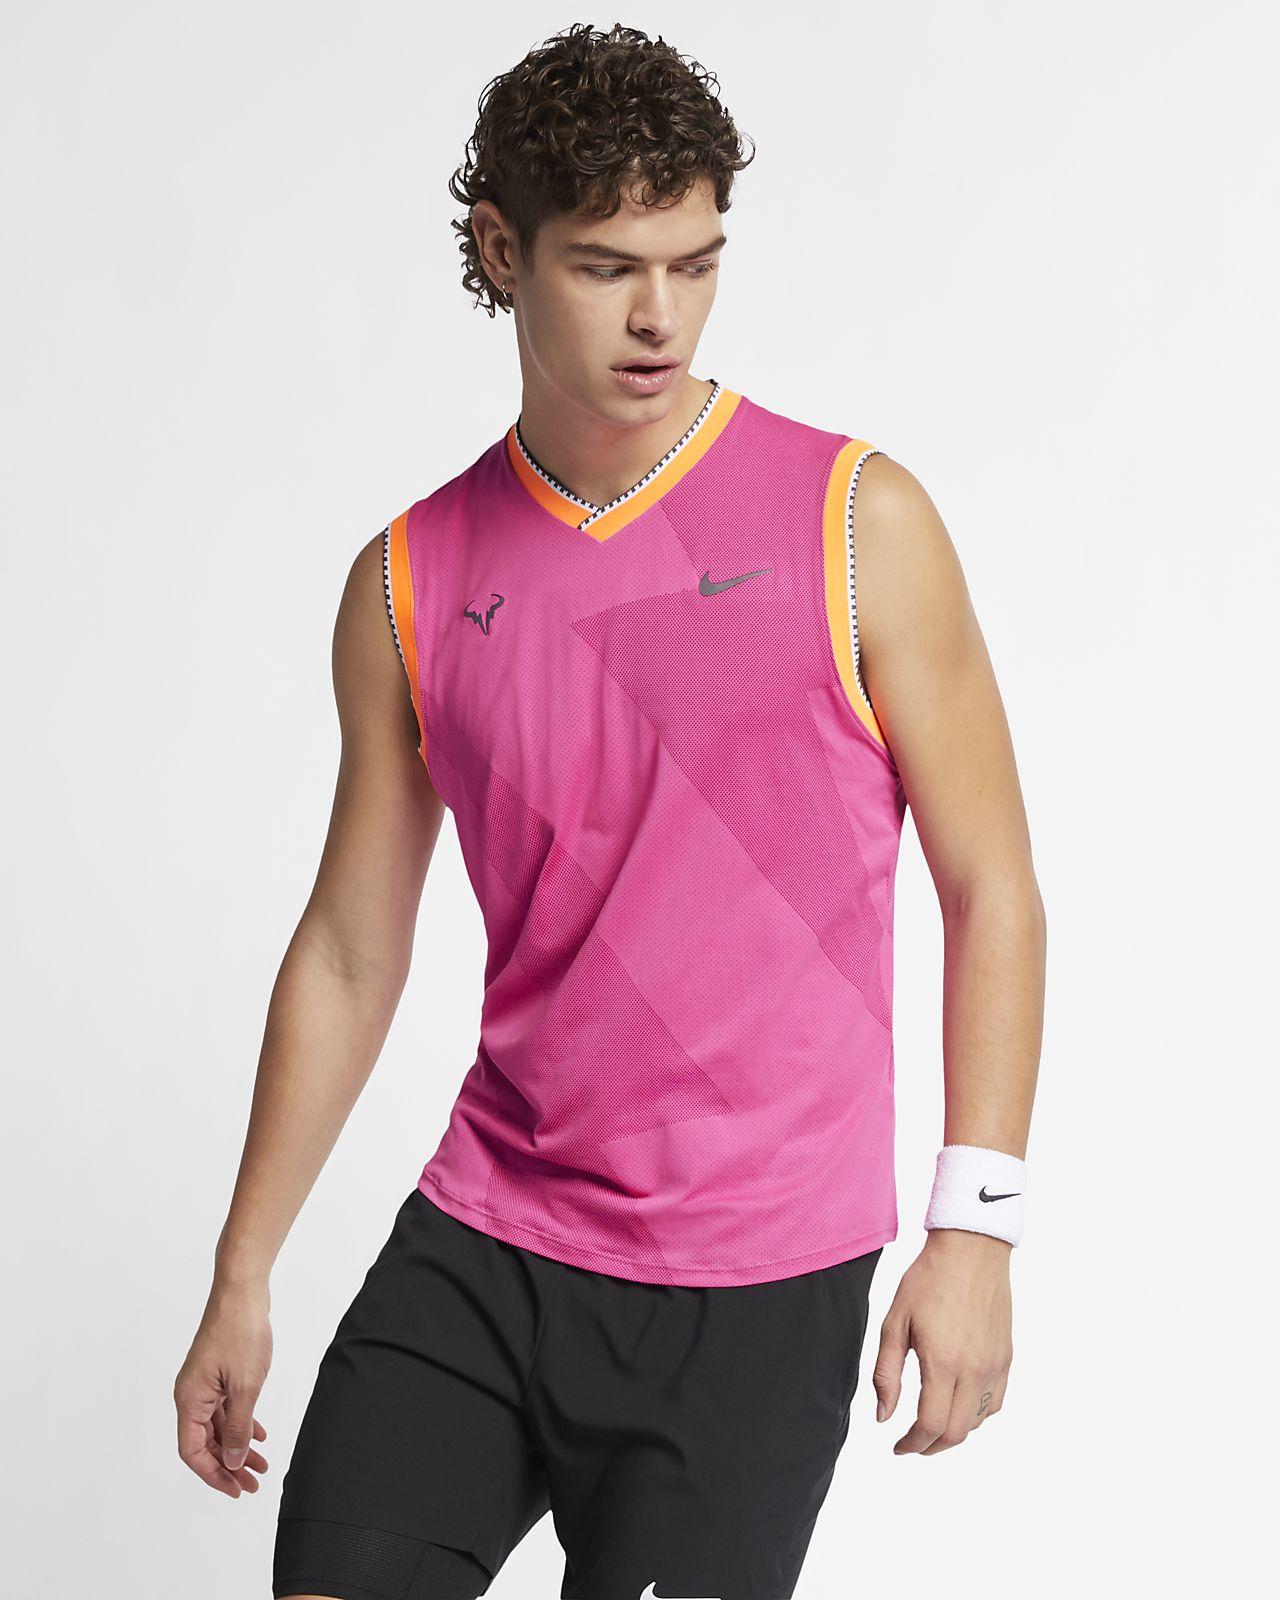 Męska koszulka bez rękawów do tenisa NikeCourt AeroReact Rafa